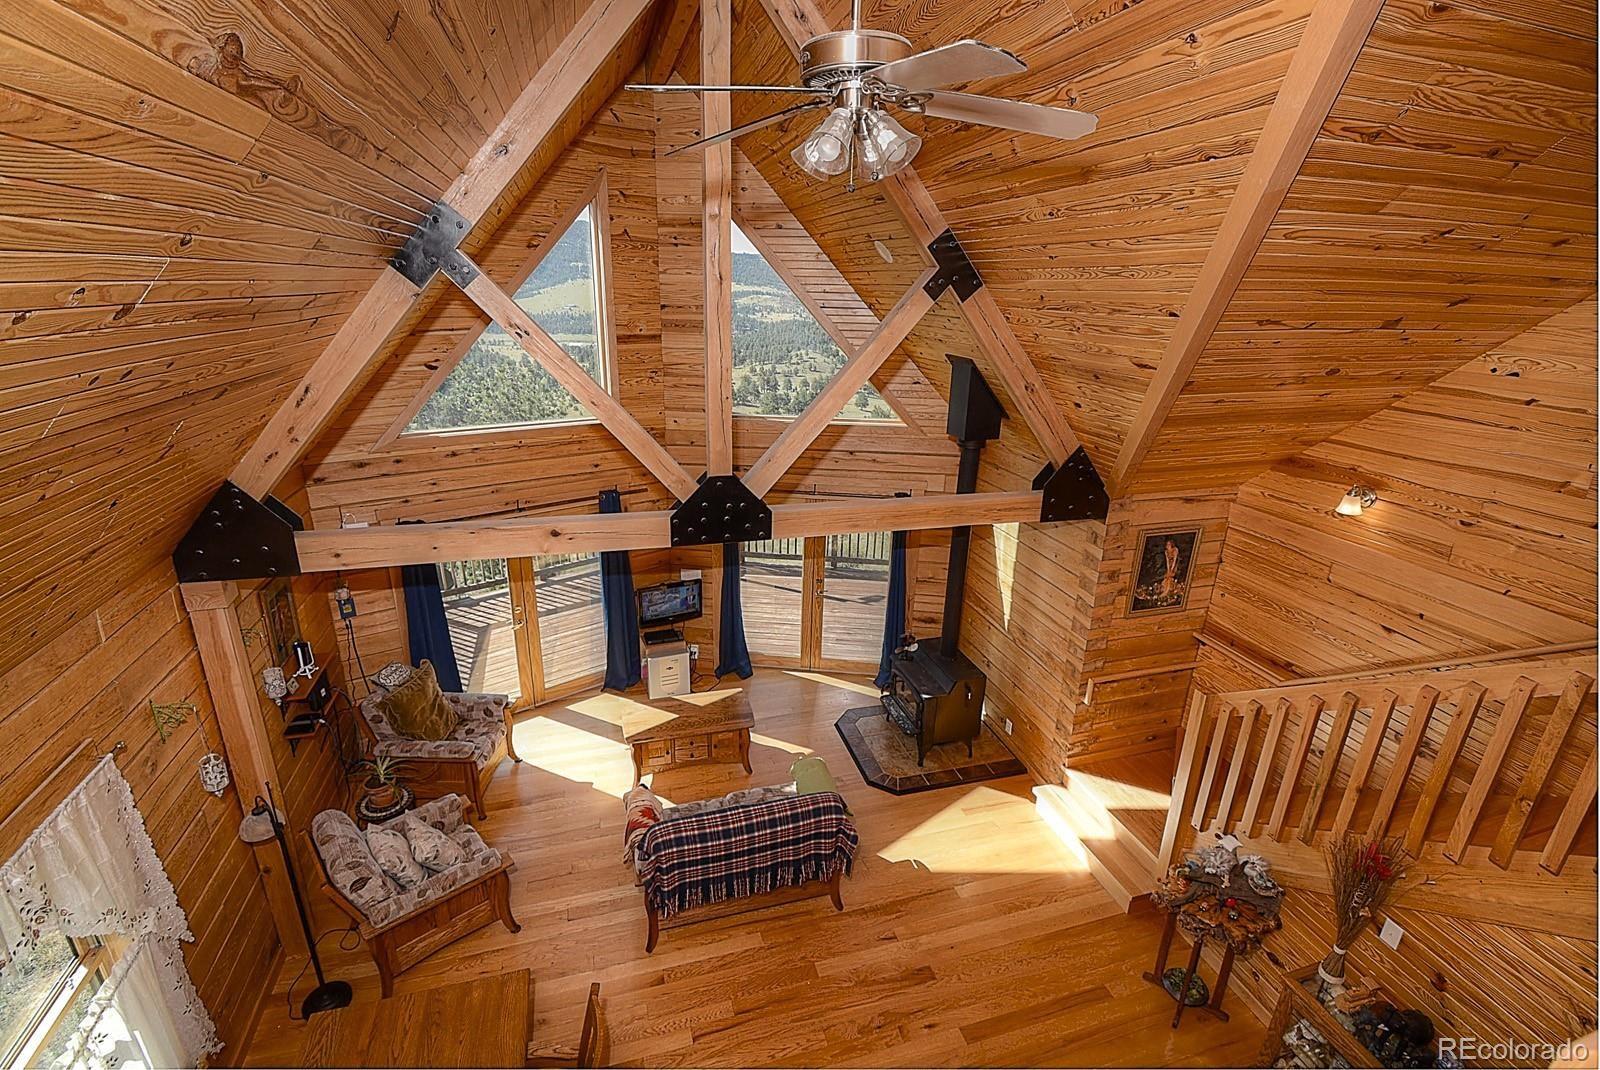 MLS# 8182693 - 19 - 396 Eagle Nest Trail, Guffey, CO 80820